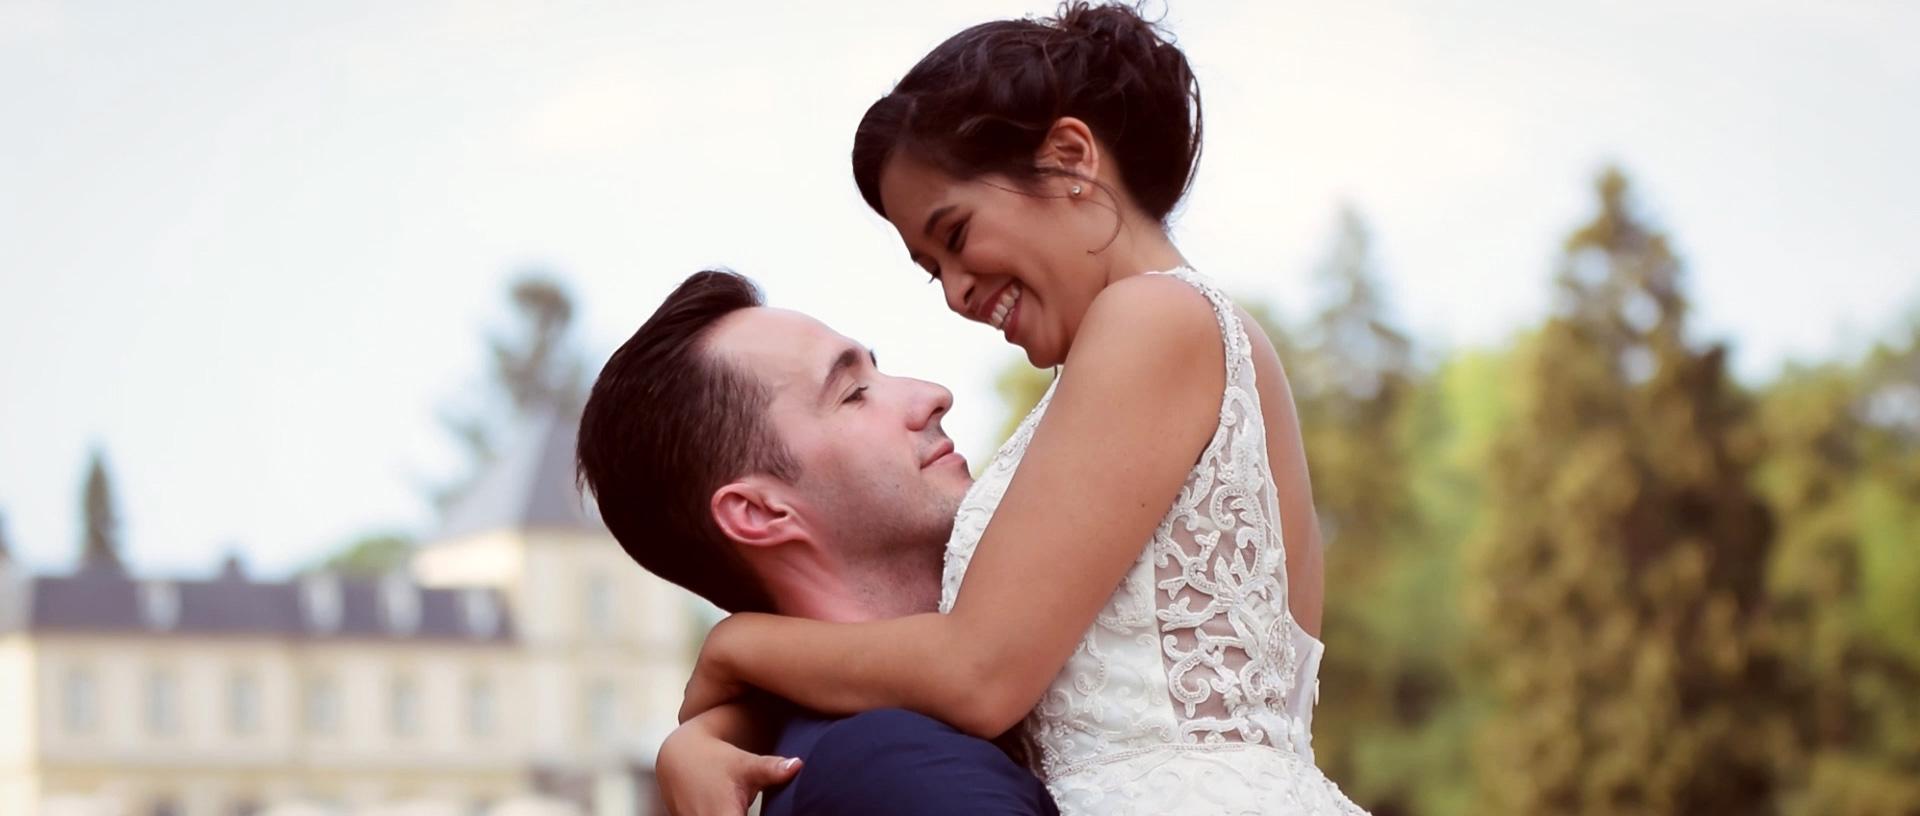 vidéaste mariage - film mariage - mariage luxembourg - mariage belgique - mariage france - Wedding videographer - Chateau bois arlon